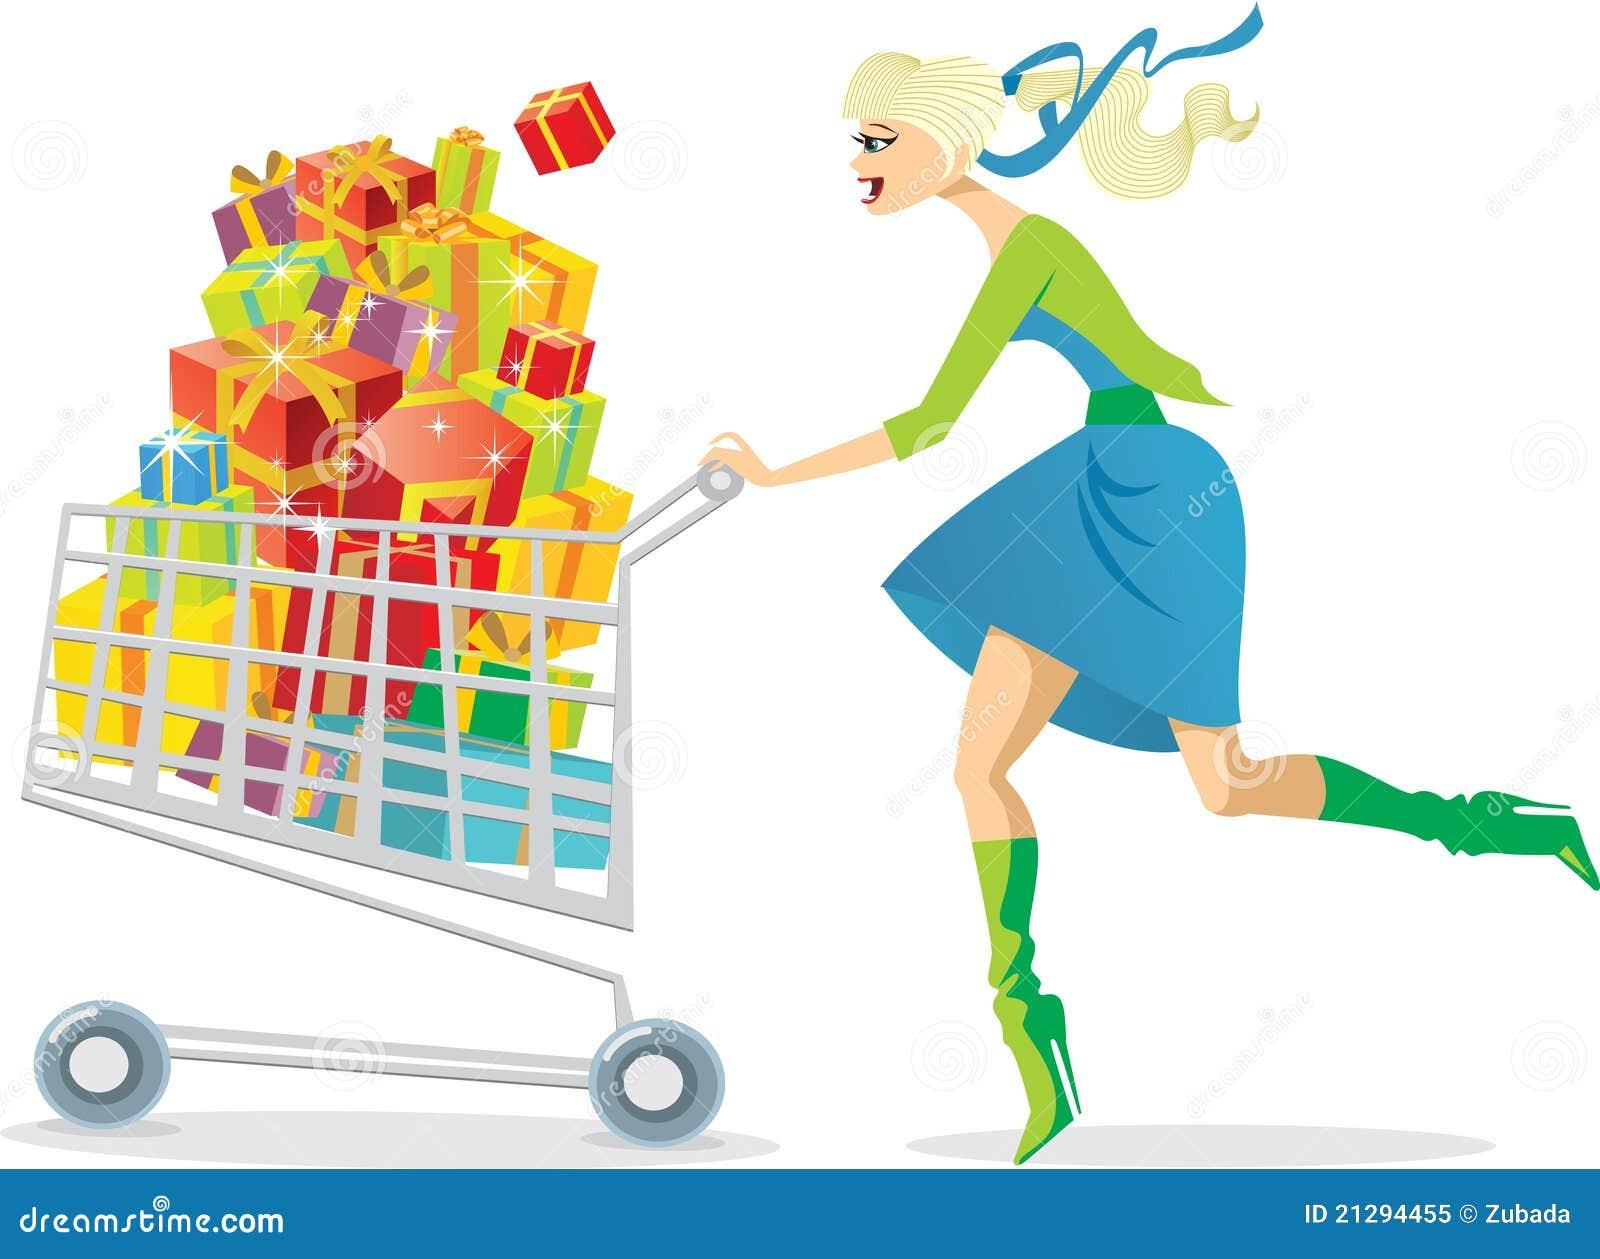 Einkaufsbummel